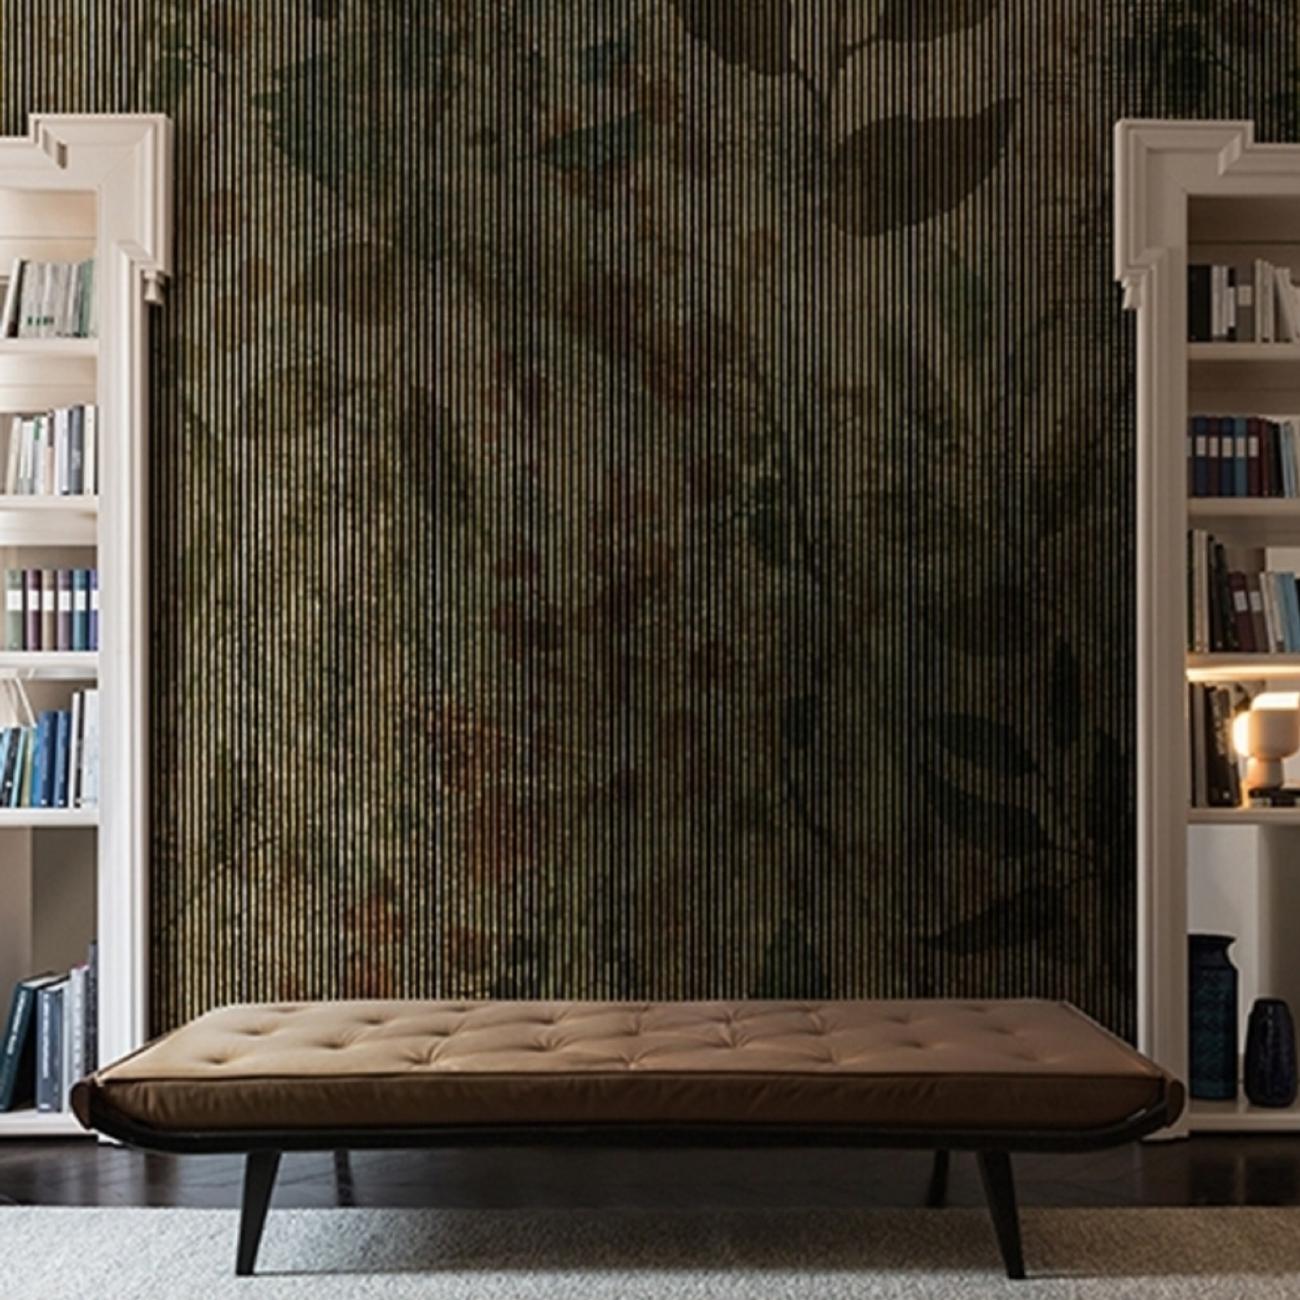 Wall & Decò La Isla Bonita Wallpaper